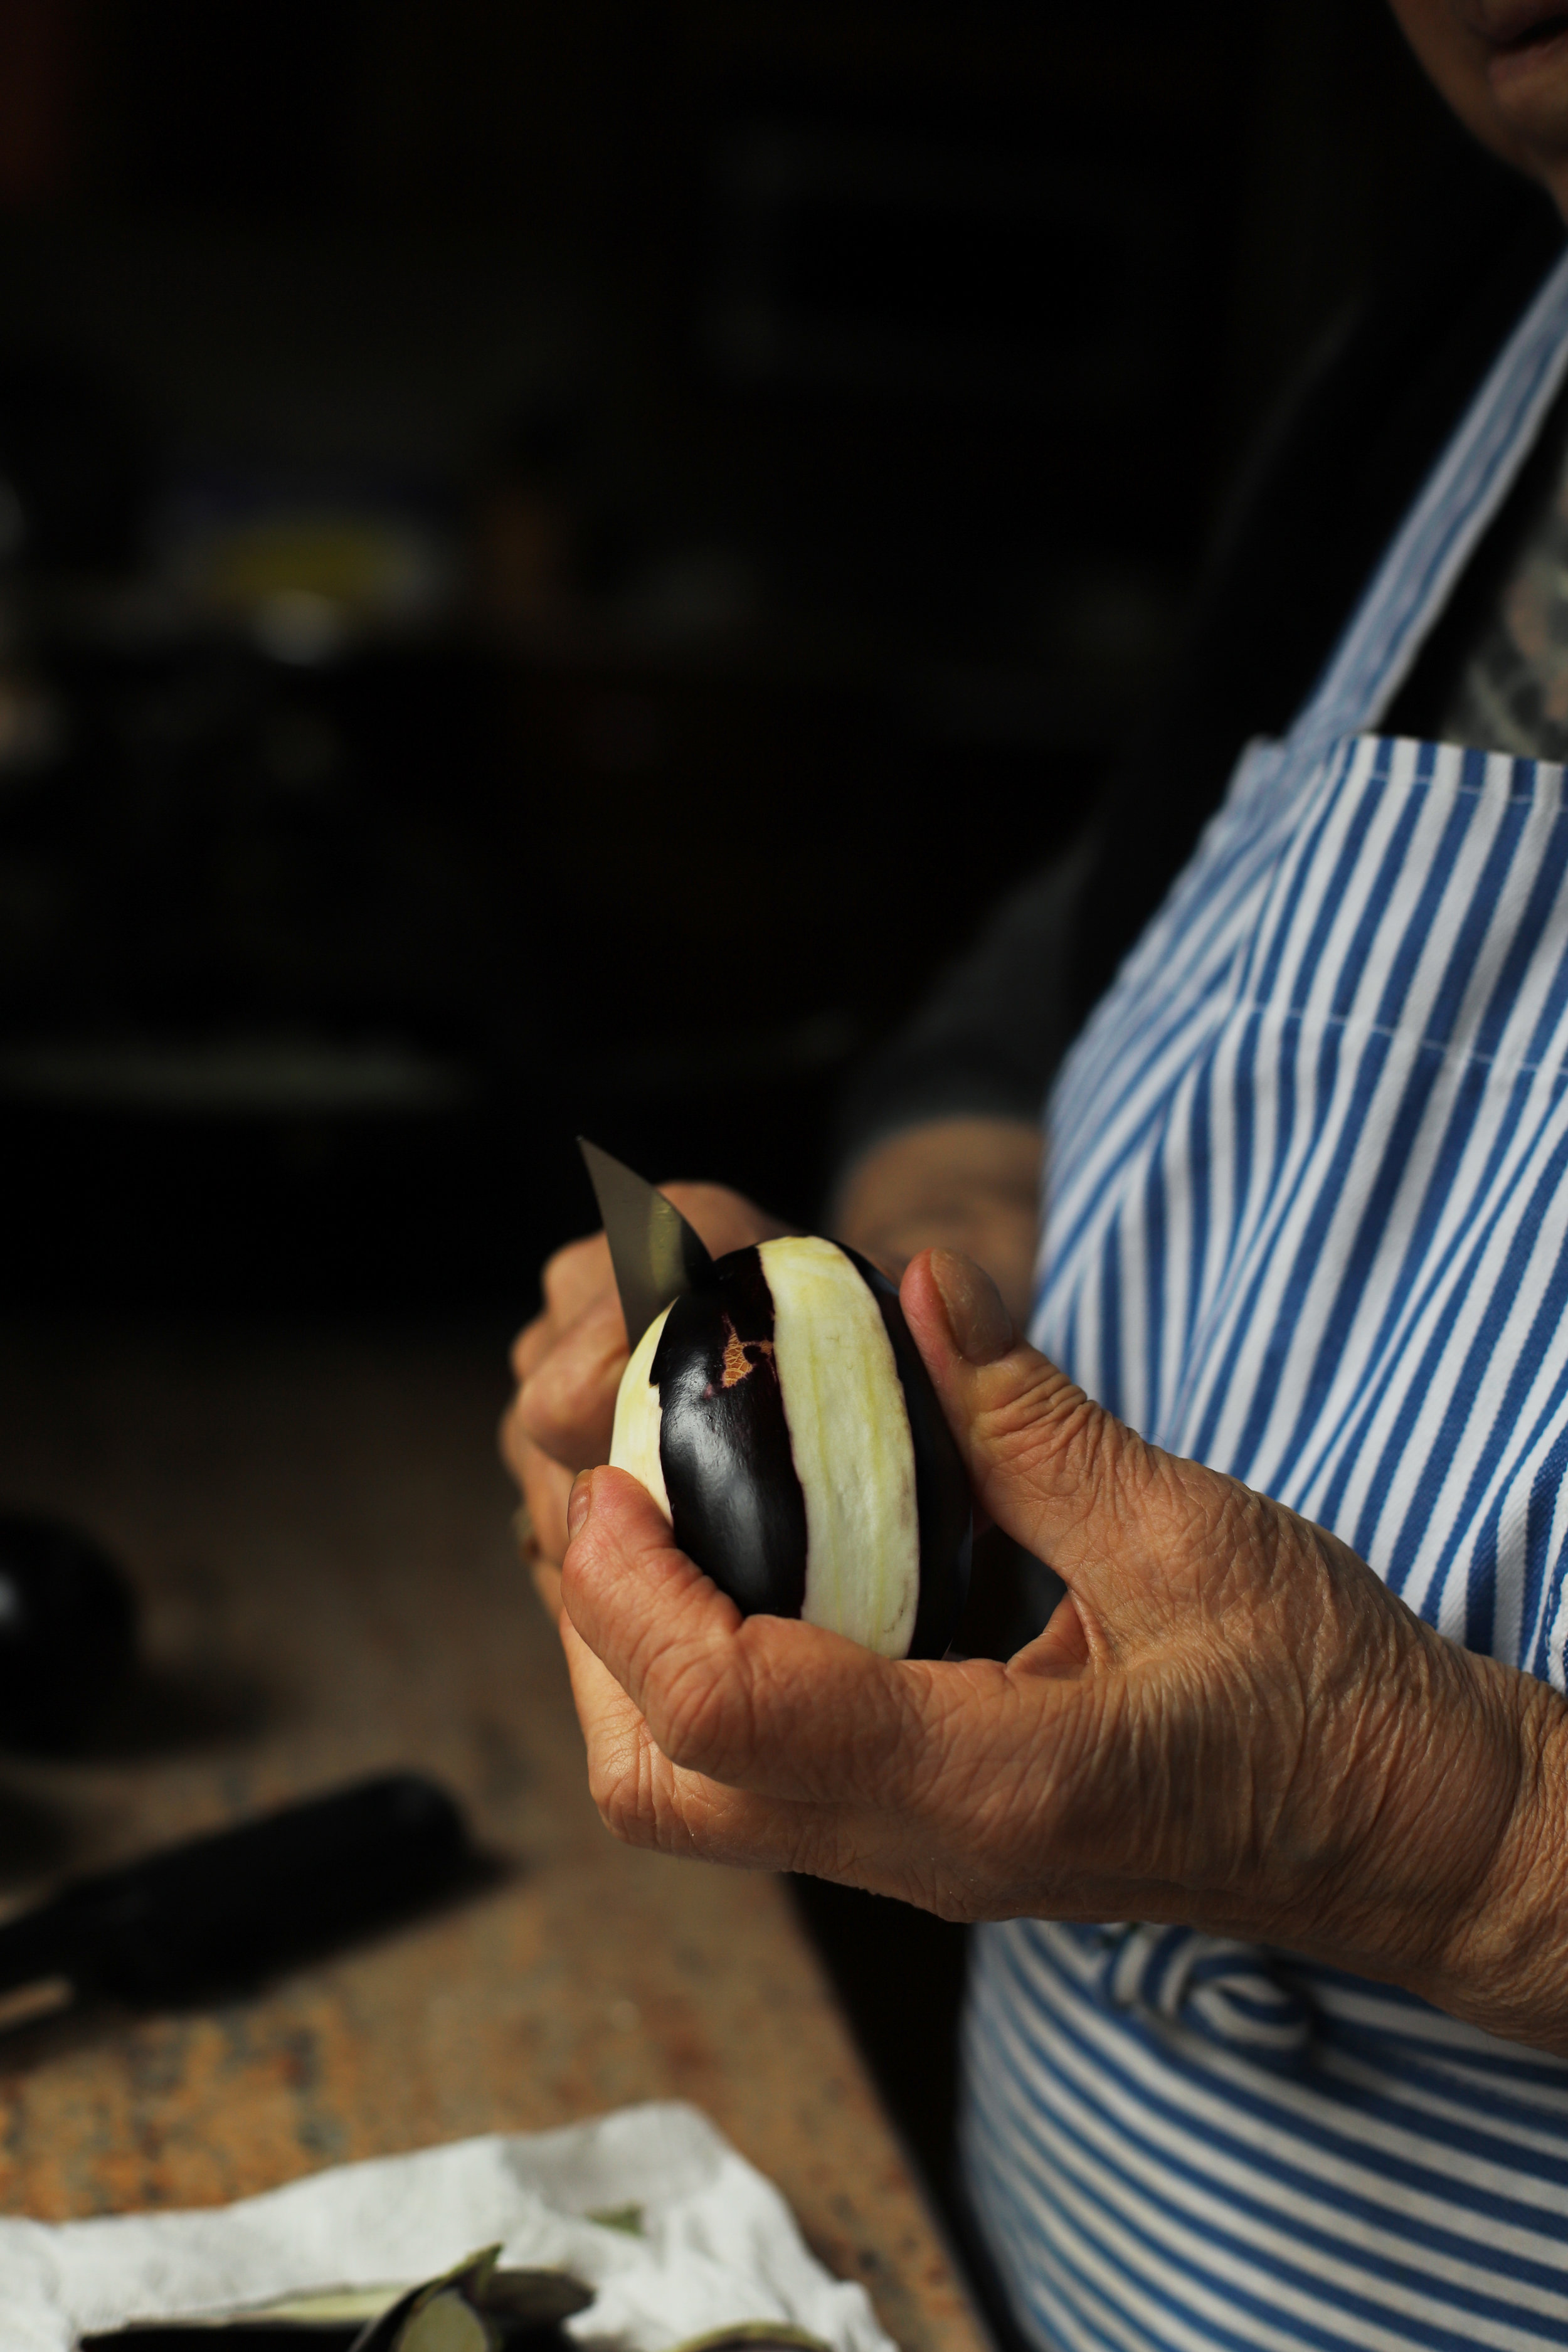 My grandmother stuffing eggplant for sheikh mahshi